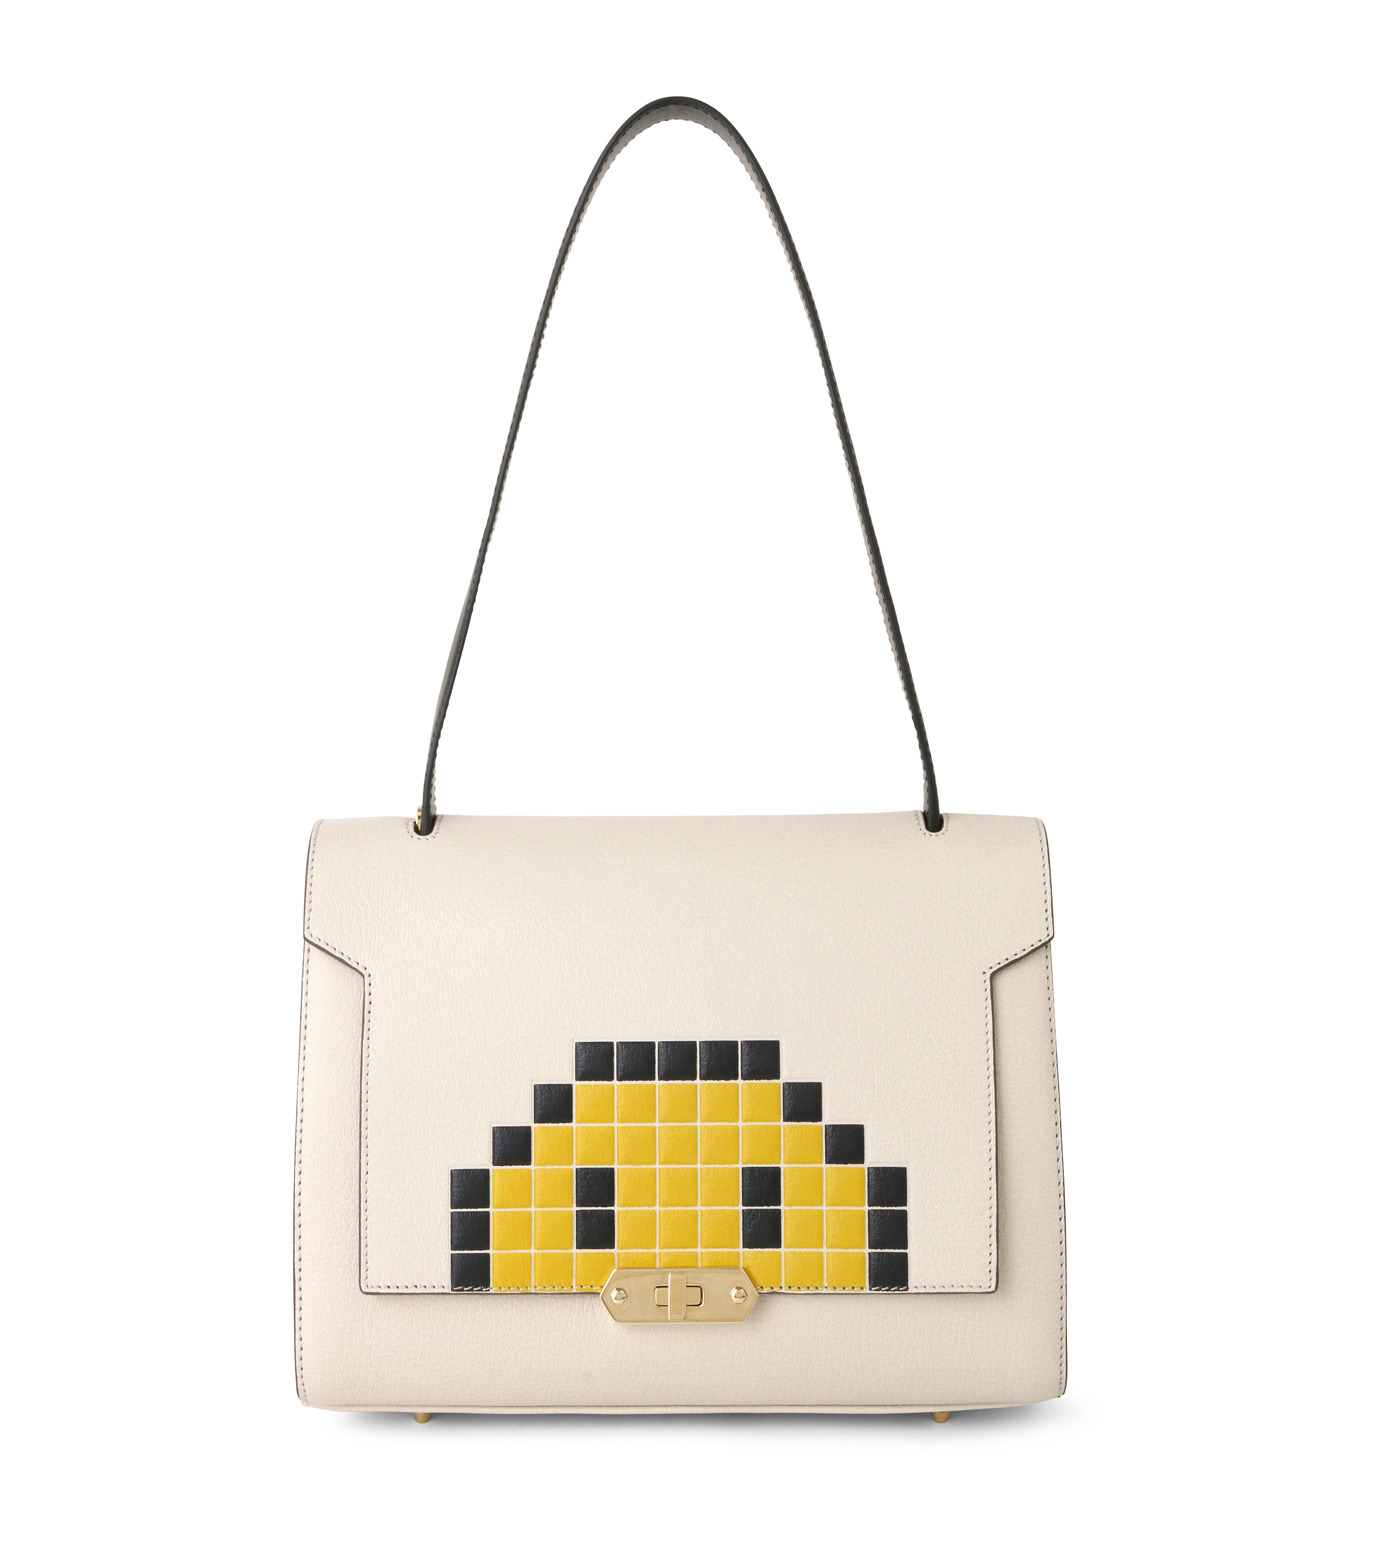 Anya Hindmarch(アニヤハインドマーチ)のBathurst Small Satchel Pixel Smiley-WHITE(ハンドバッグ/hand bag)-923248-5 拡大詳細画像1